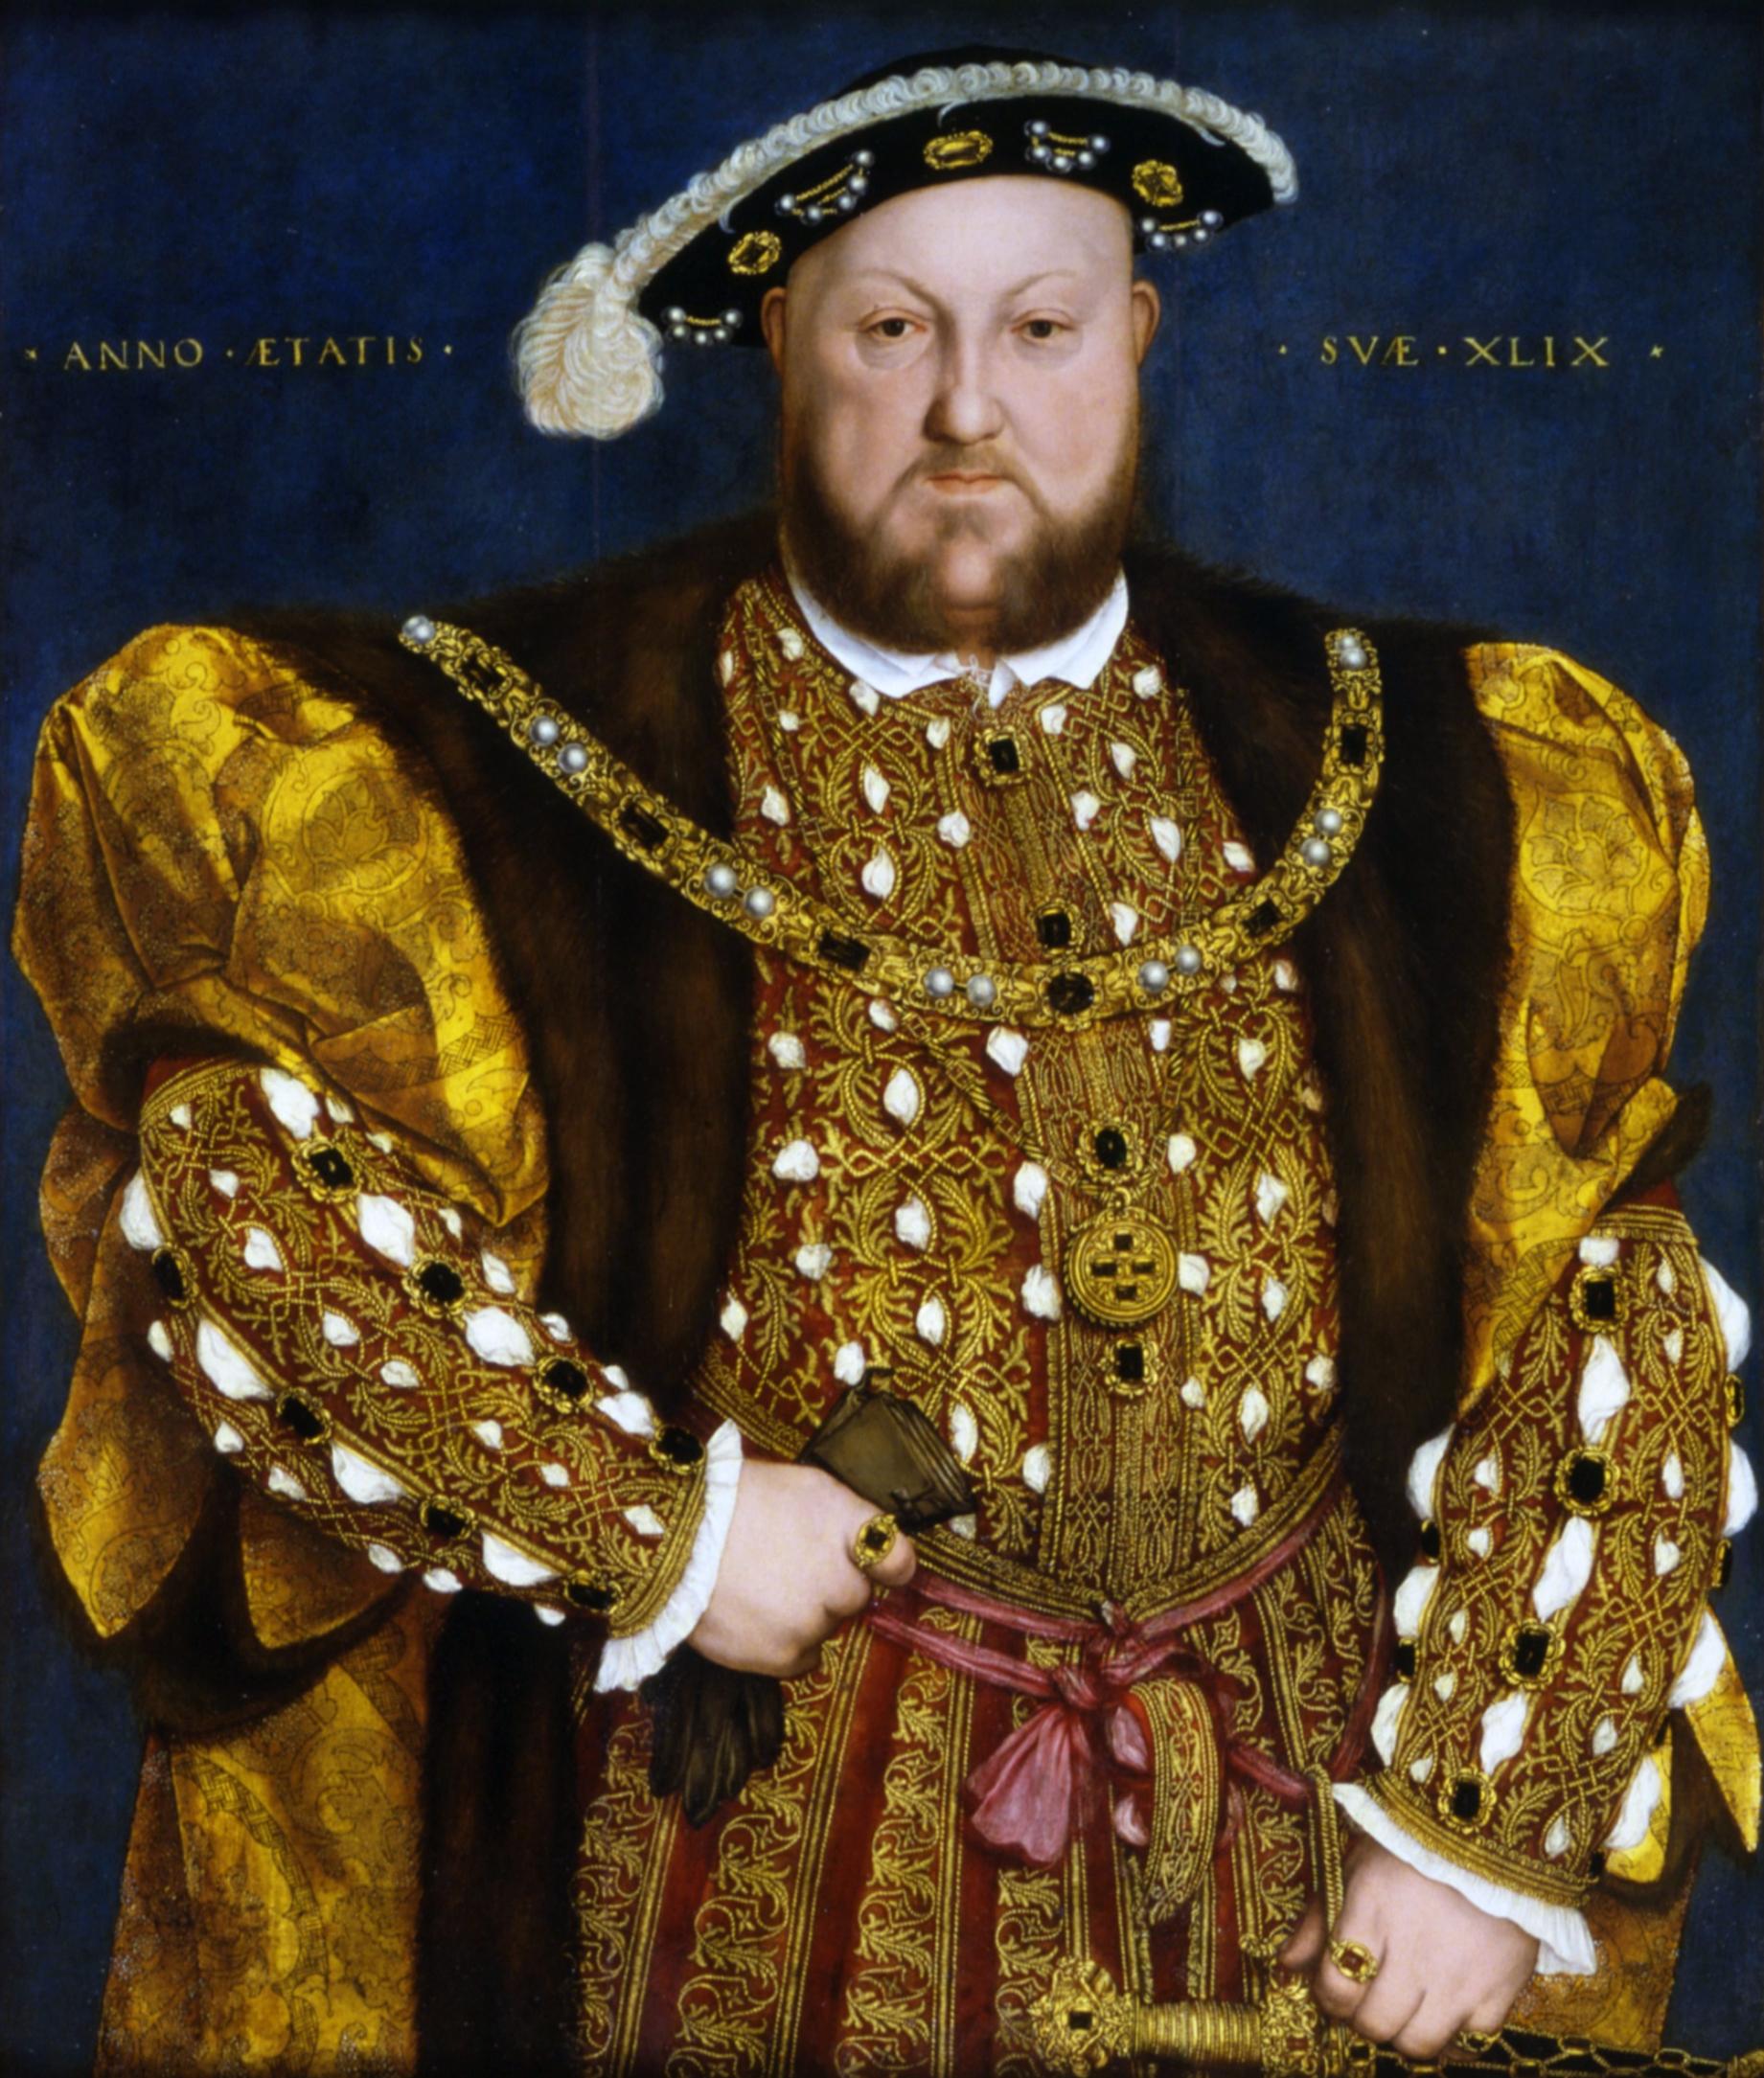 Henri VIII